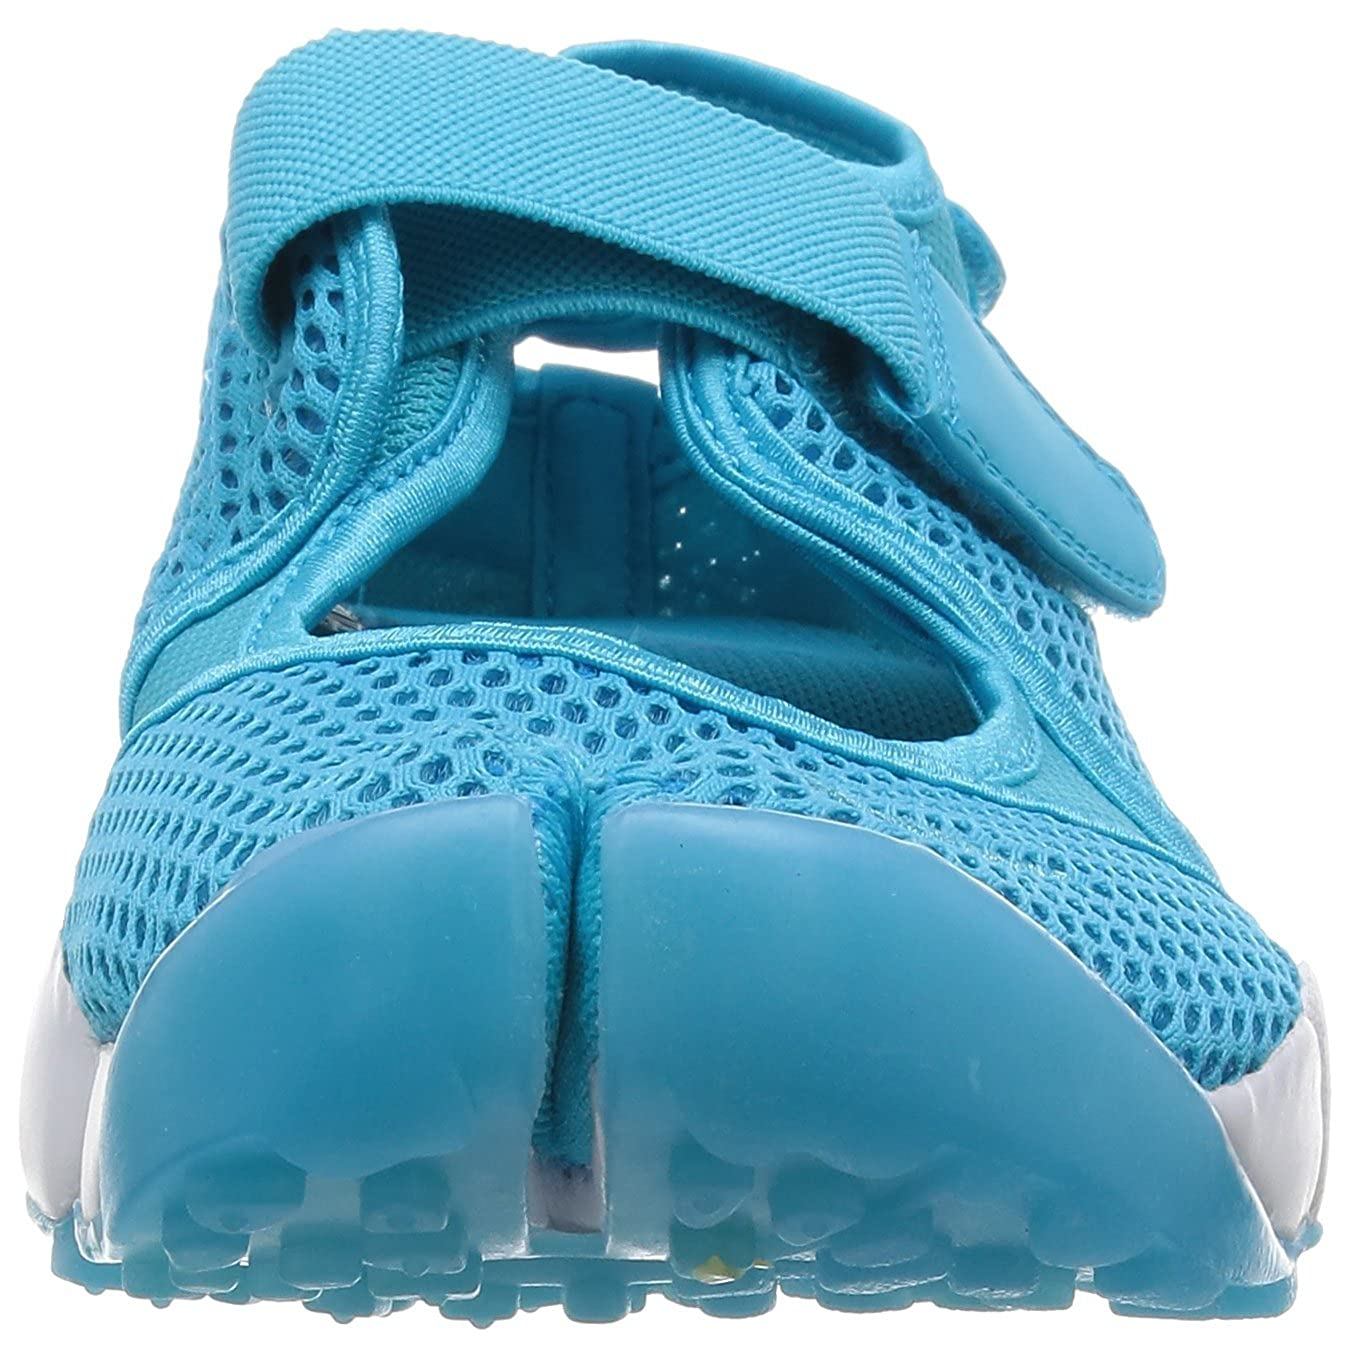 new products 34d7a 69cc6 Amazon.com   Nike Womens Wmns Air Rift BR, GAMMA BLUE BLUE LAGOON-WHITE, 6  US   Fashion Sneakers